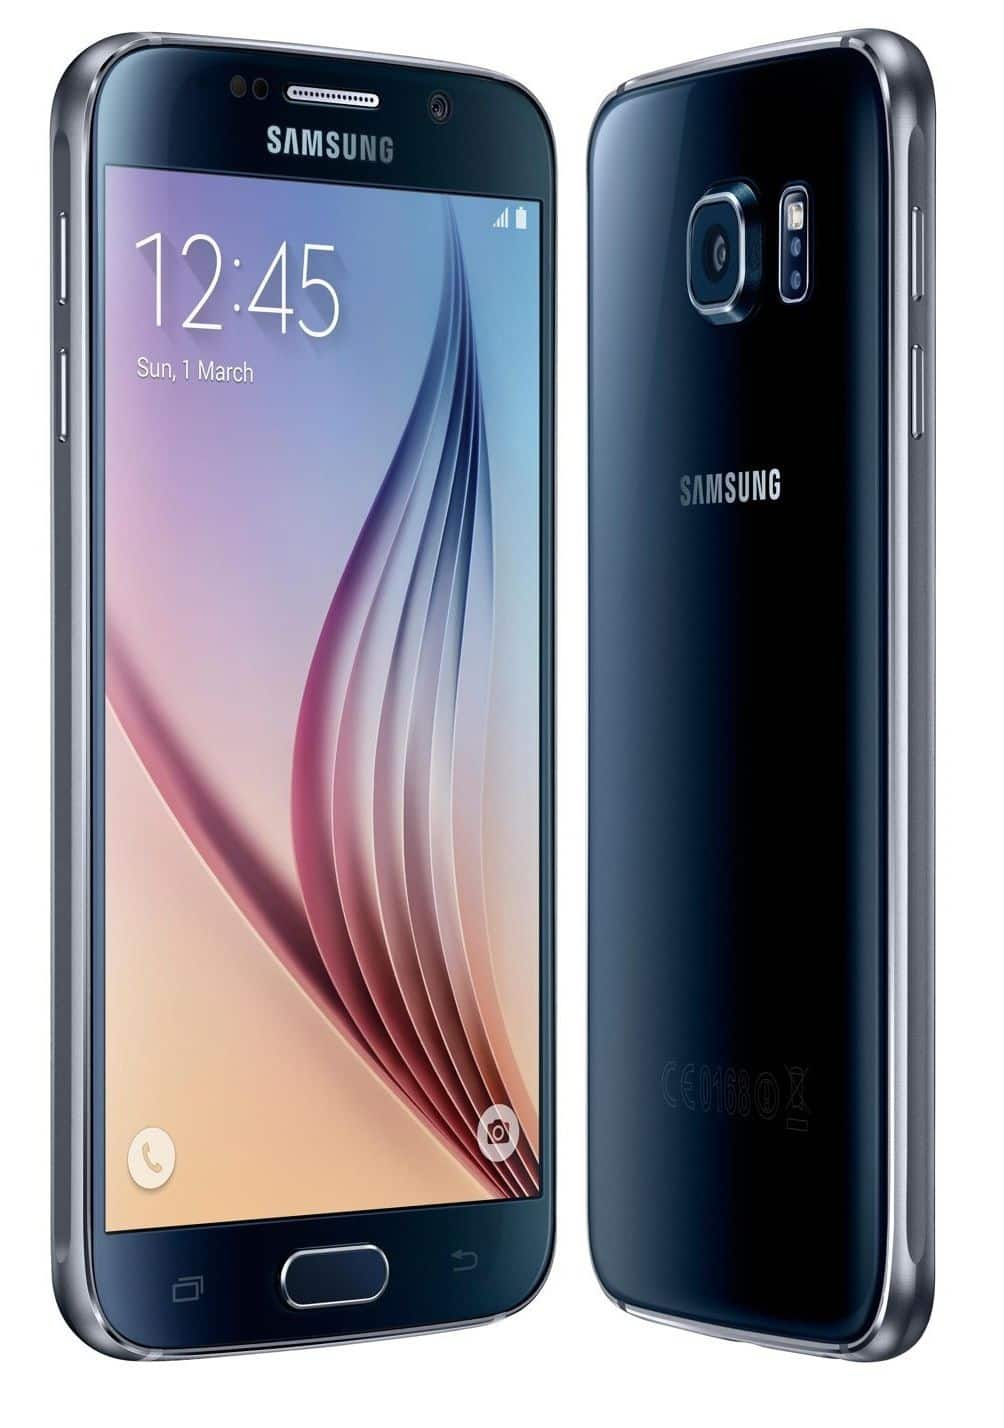 Samsung Galaxy S6 G920F 32GB Factory Unlocked GSM 4G LTE Octa-Core Phone $630 + Free Shipping (eBay Daily Deal)